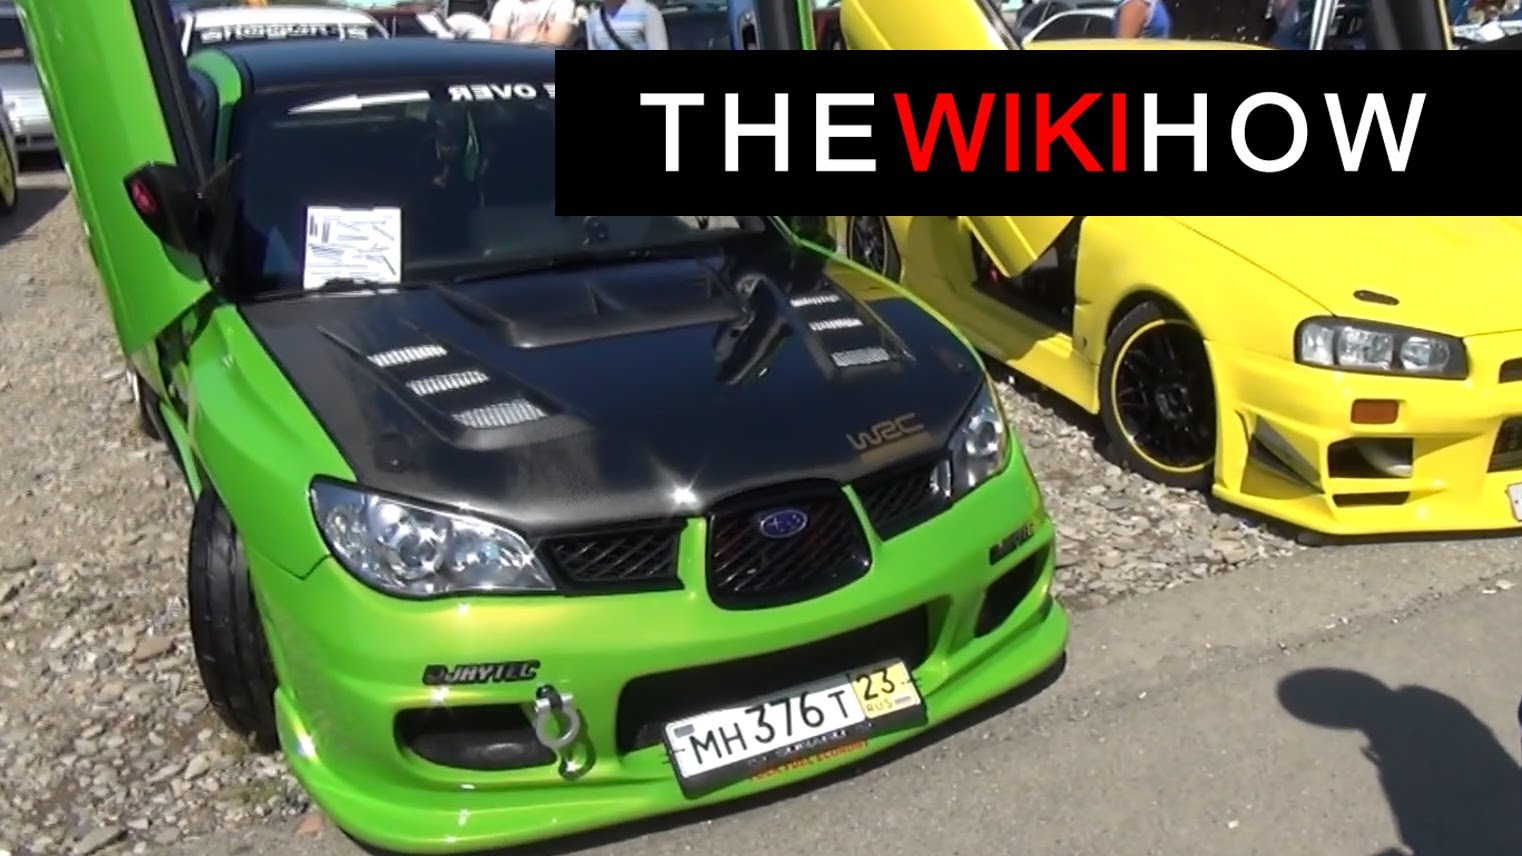 Subaru Impreza WRX STI 2.0Т 400+ л.с